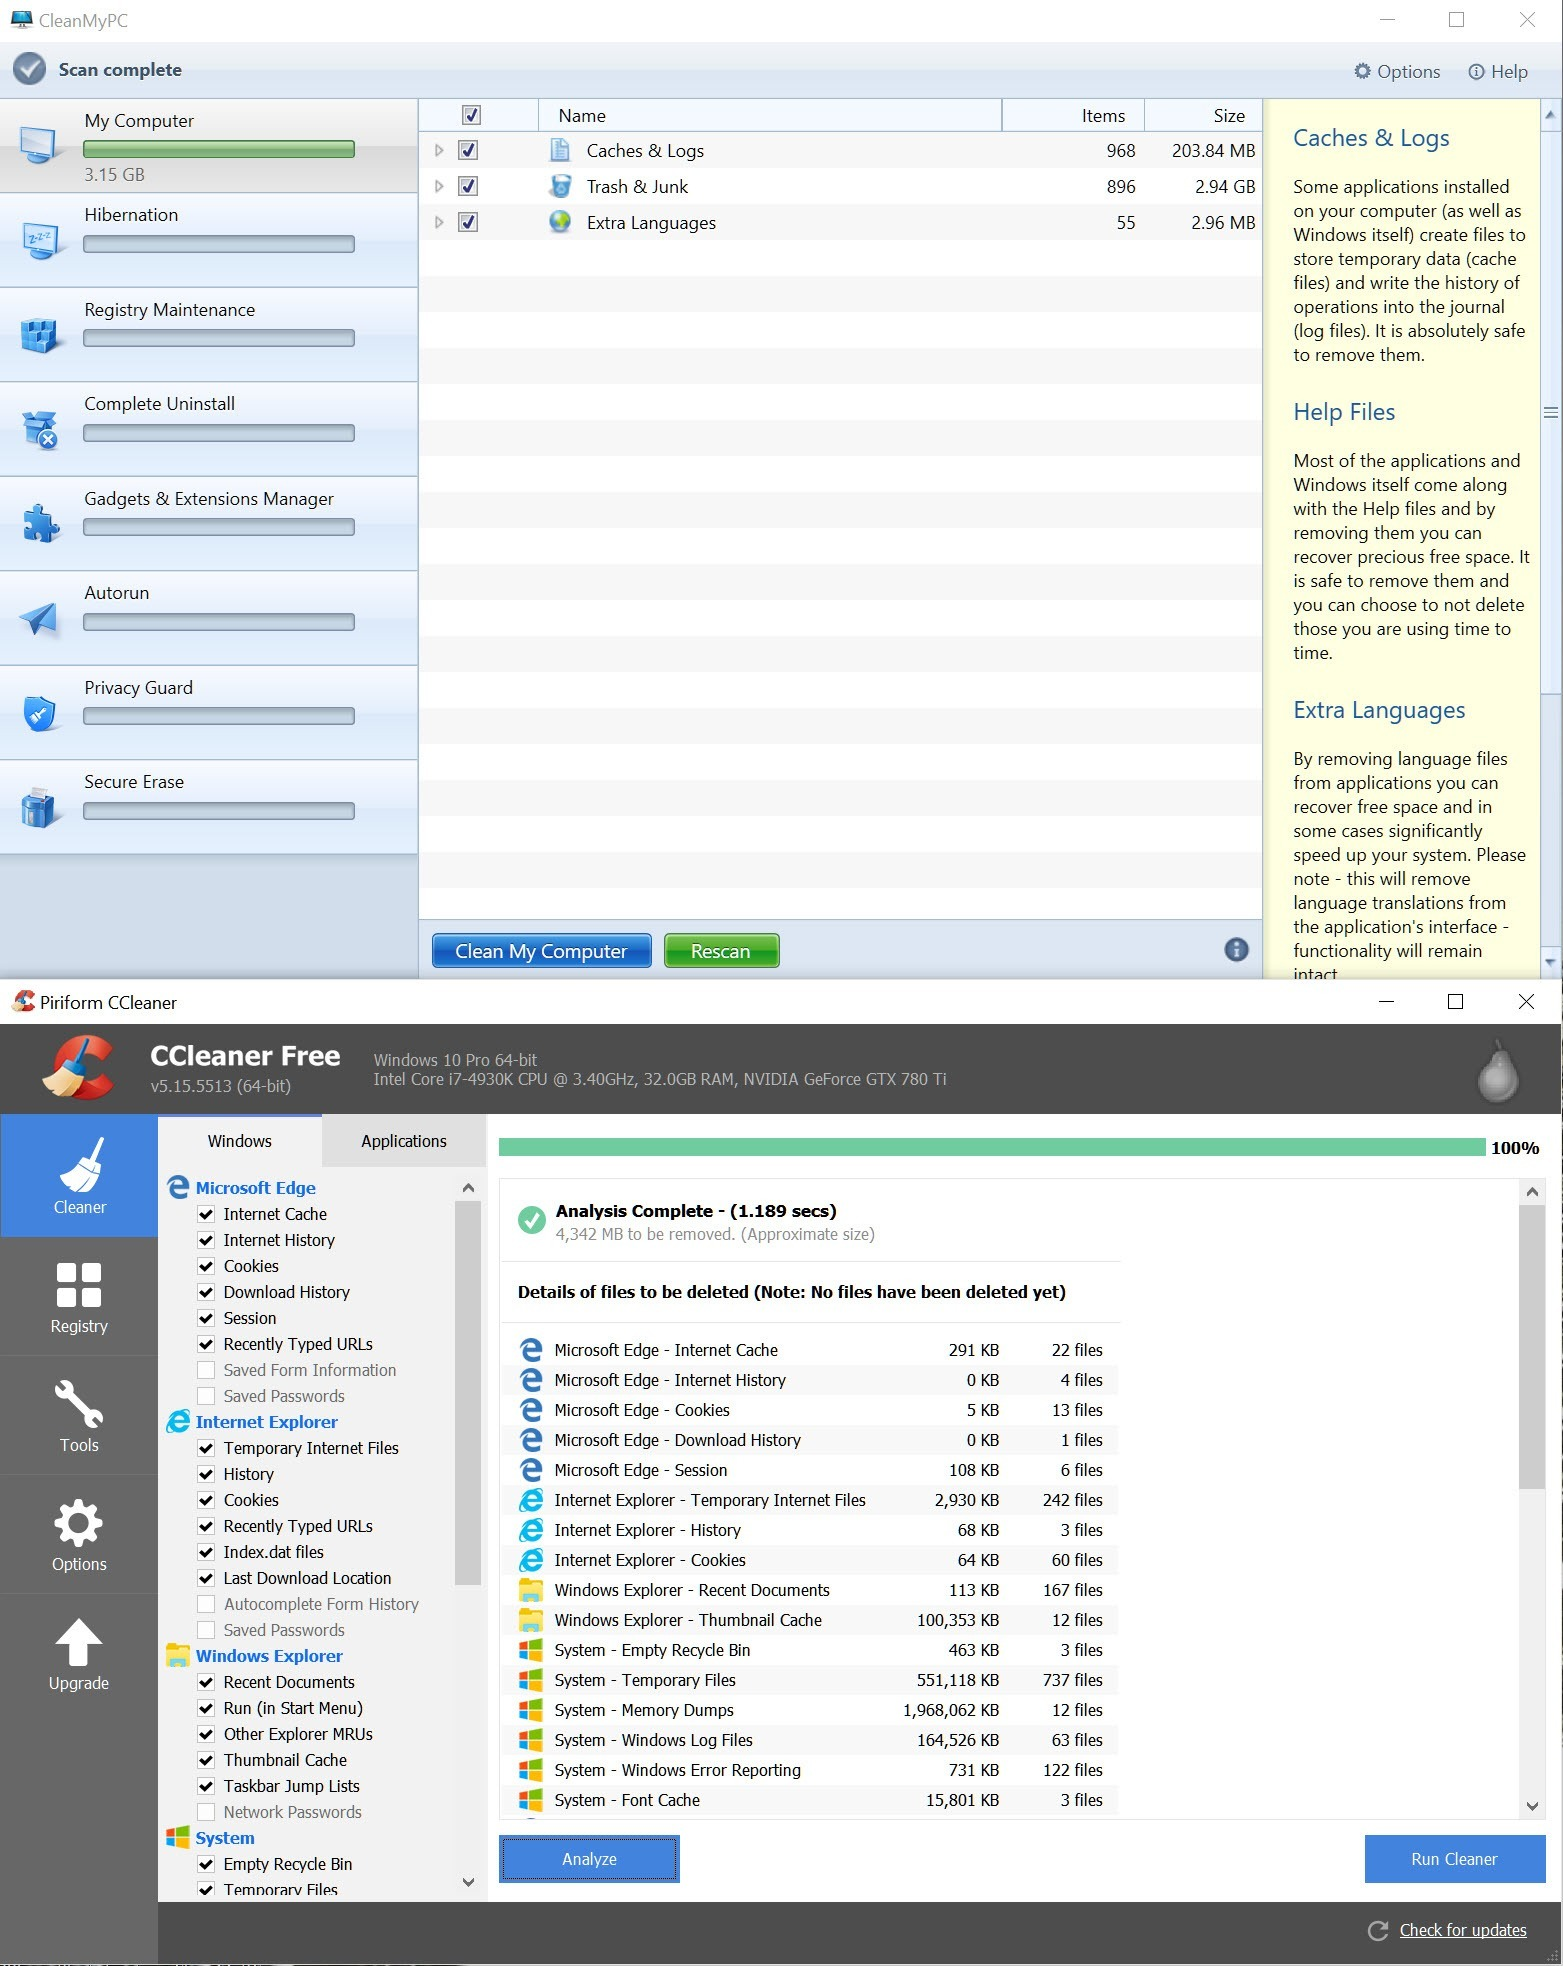 cleanmypc cccleaner data comparison